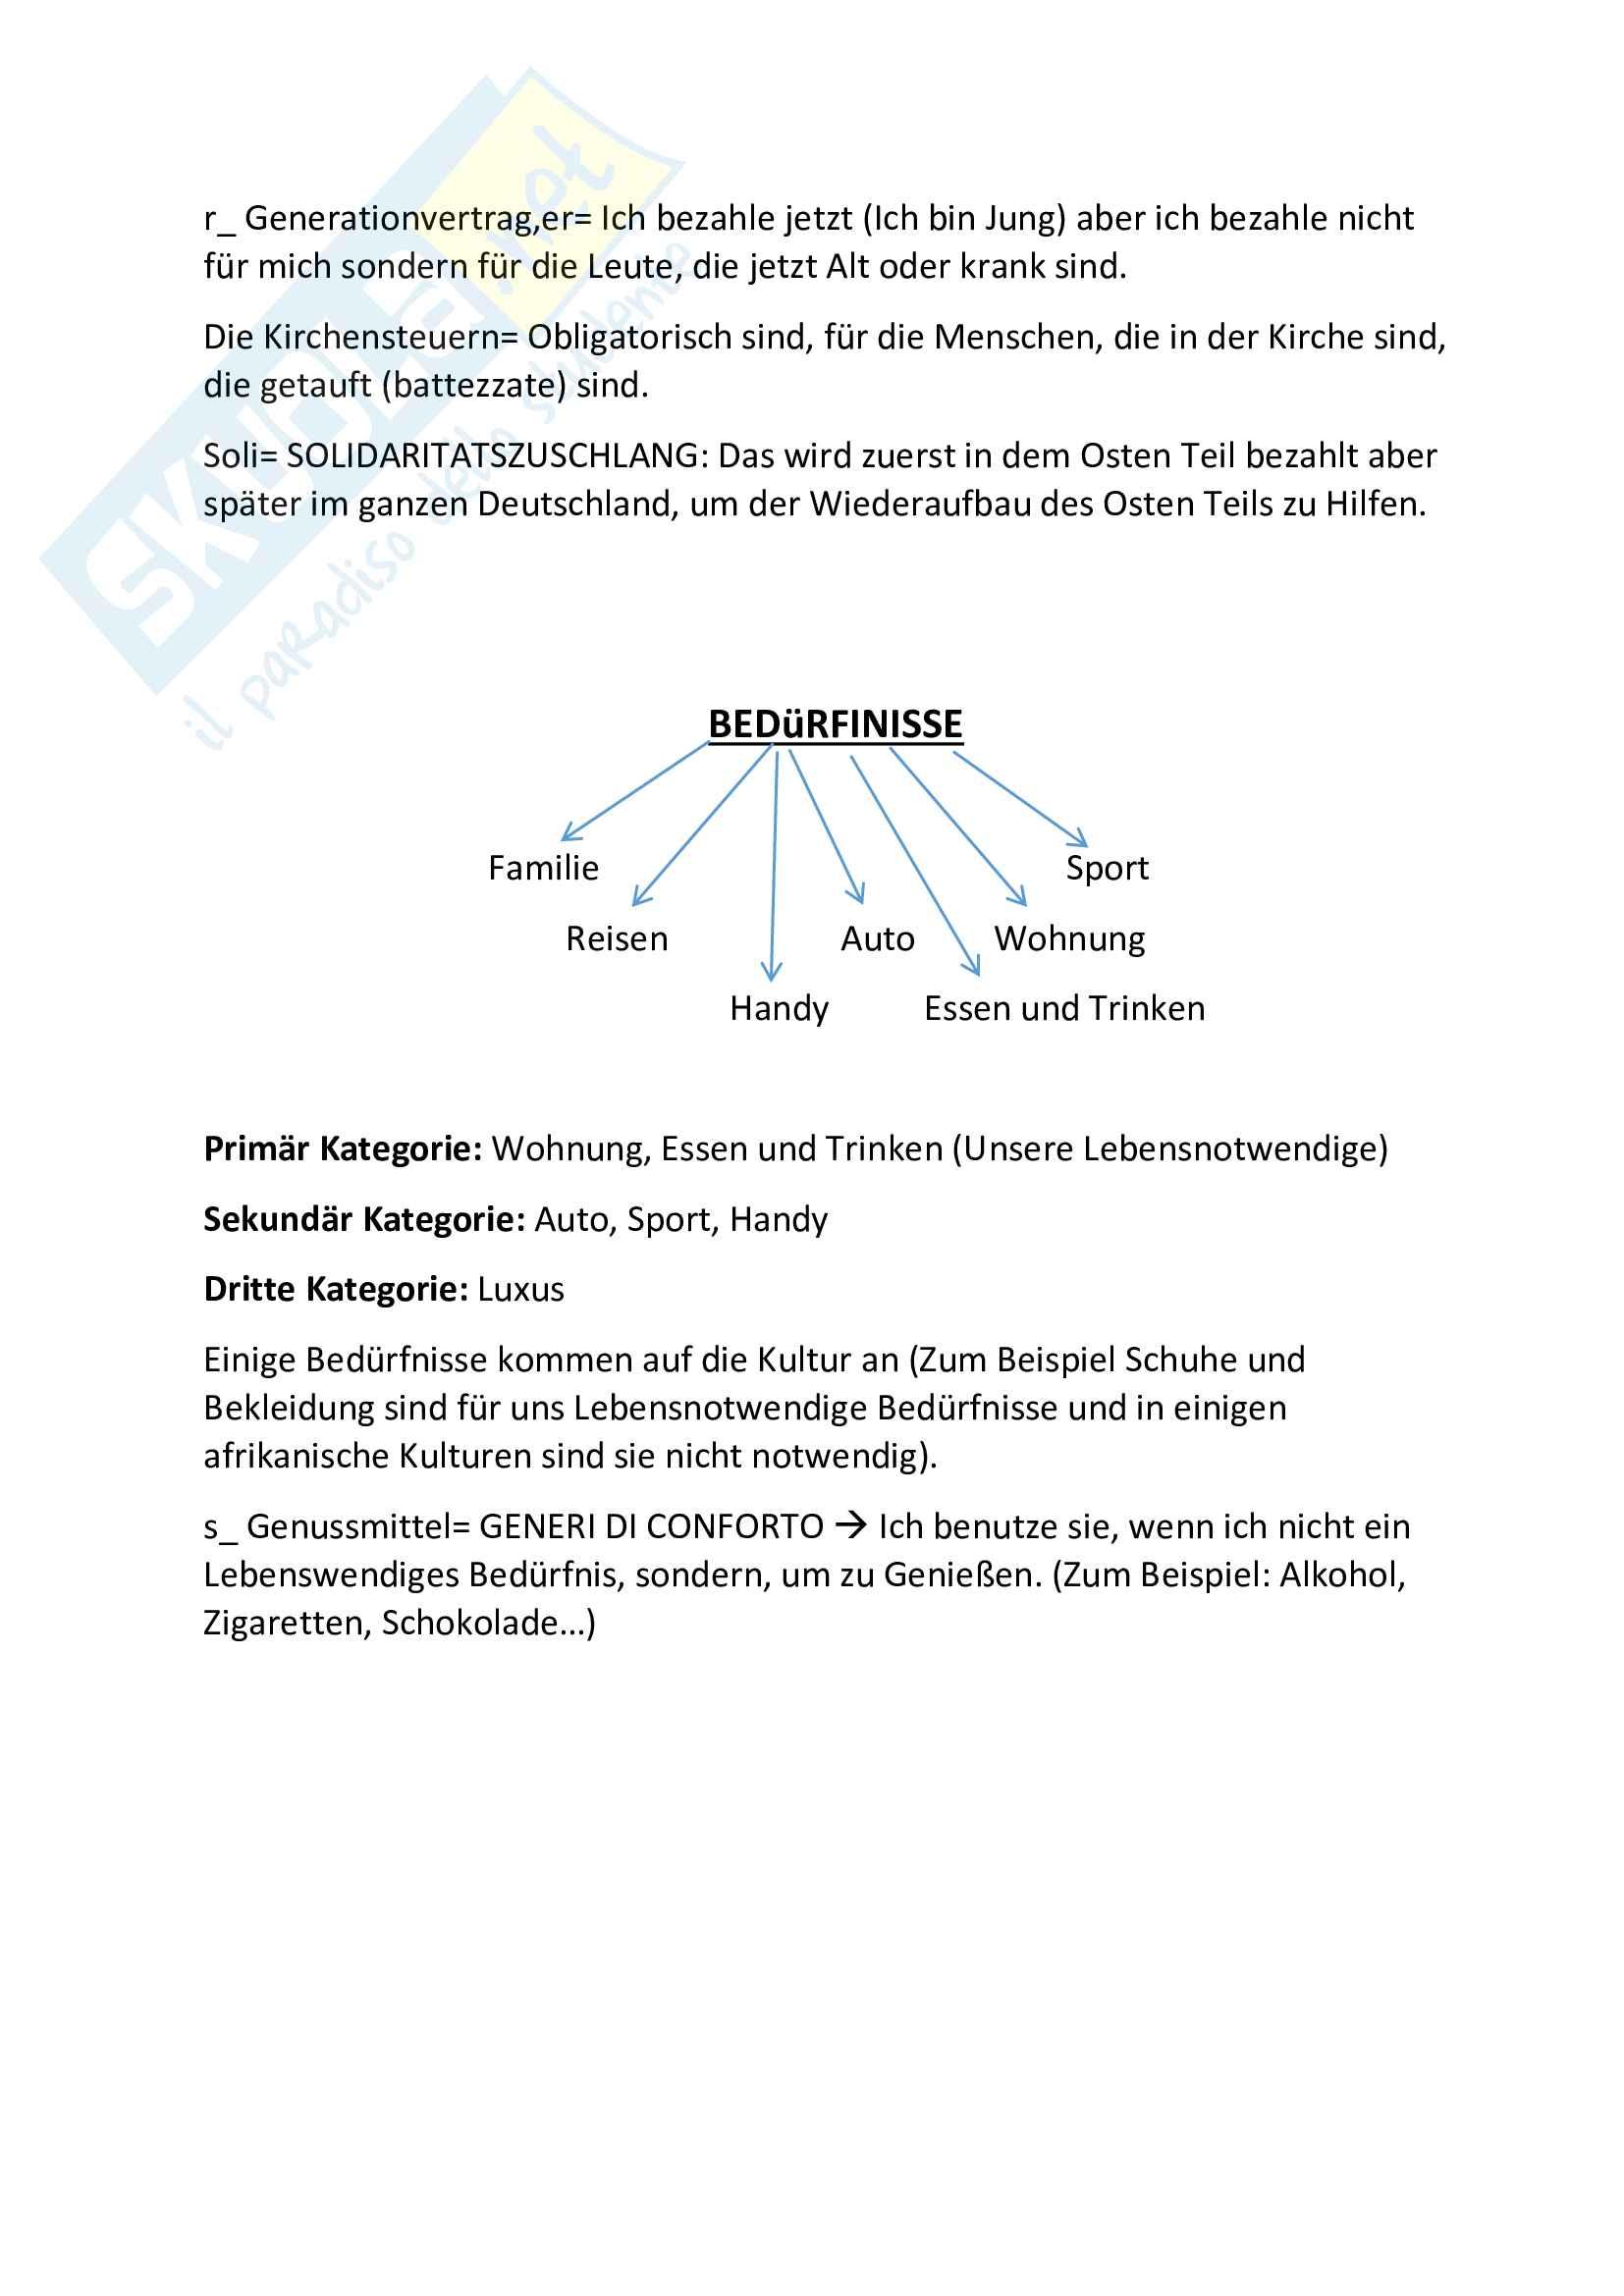 Appunti linguaggi settoriali tedesco Pag. 11